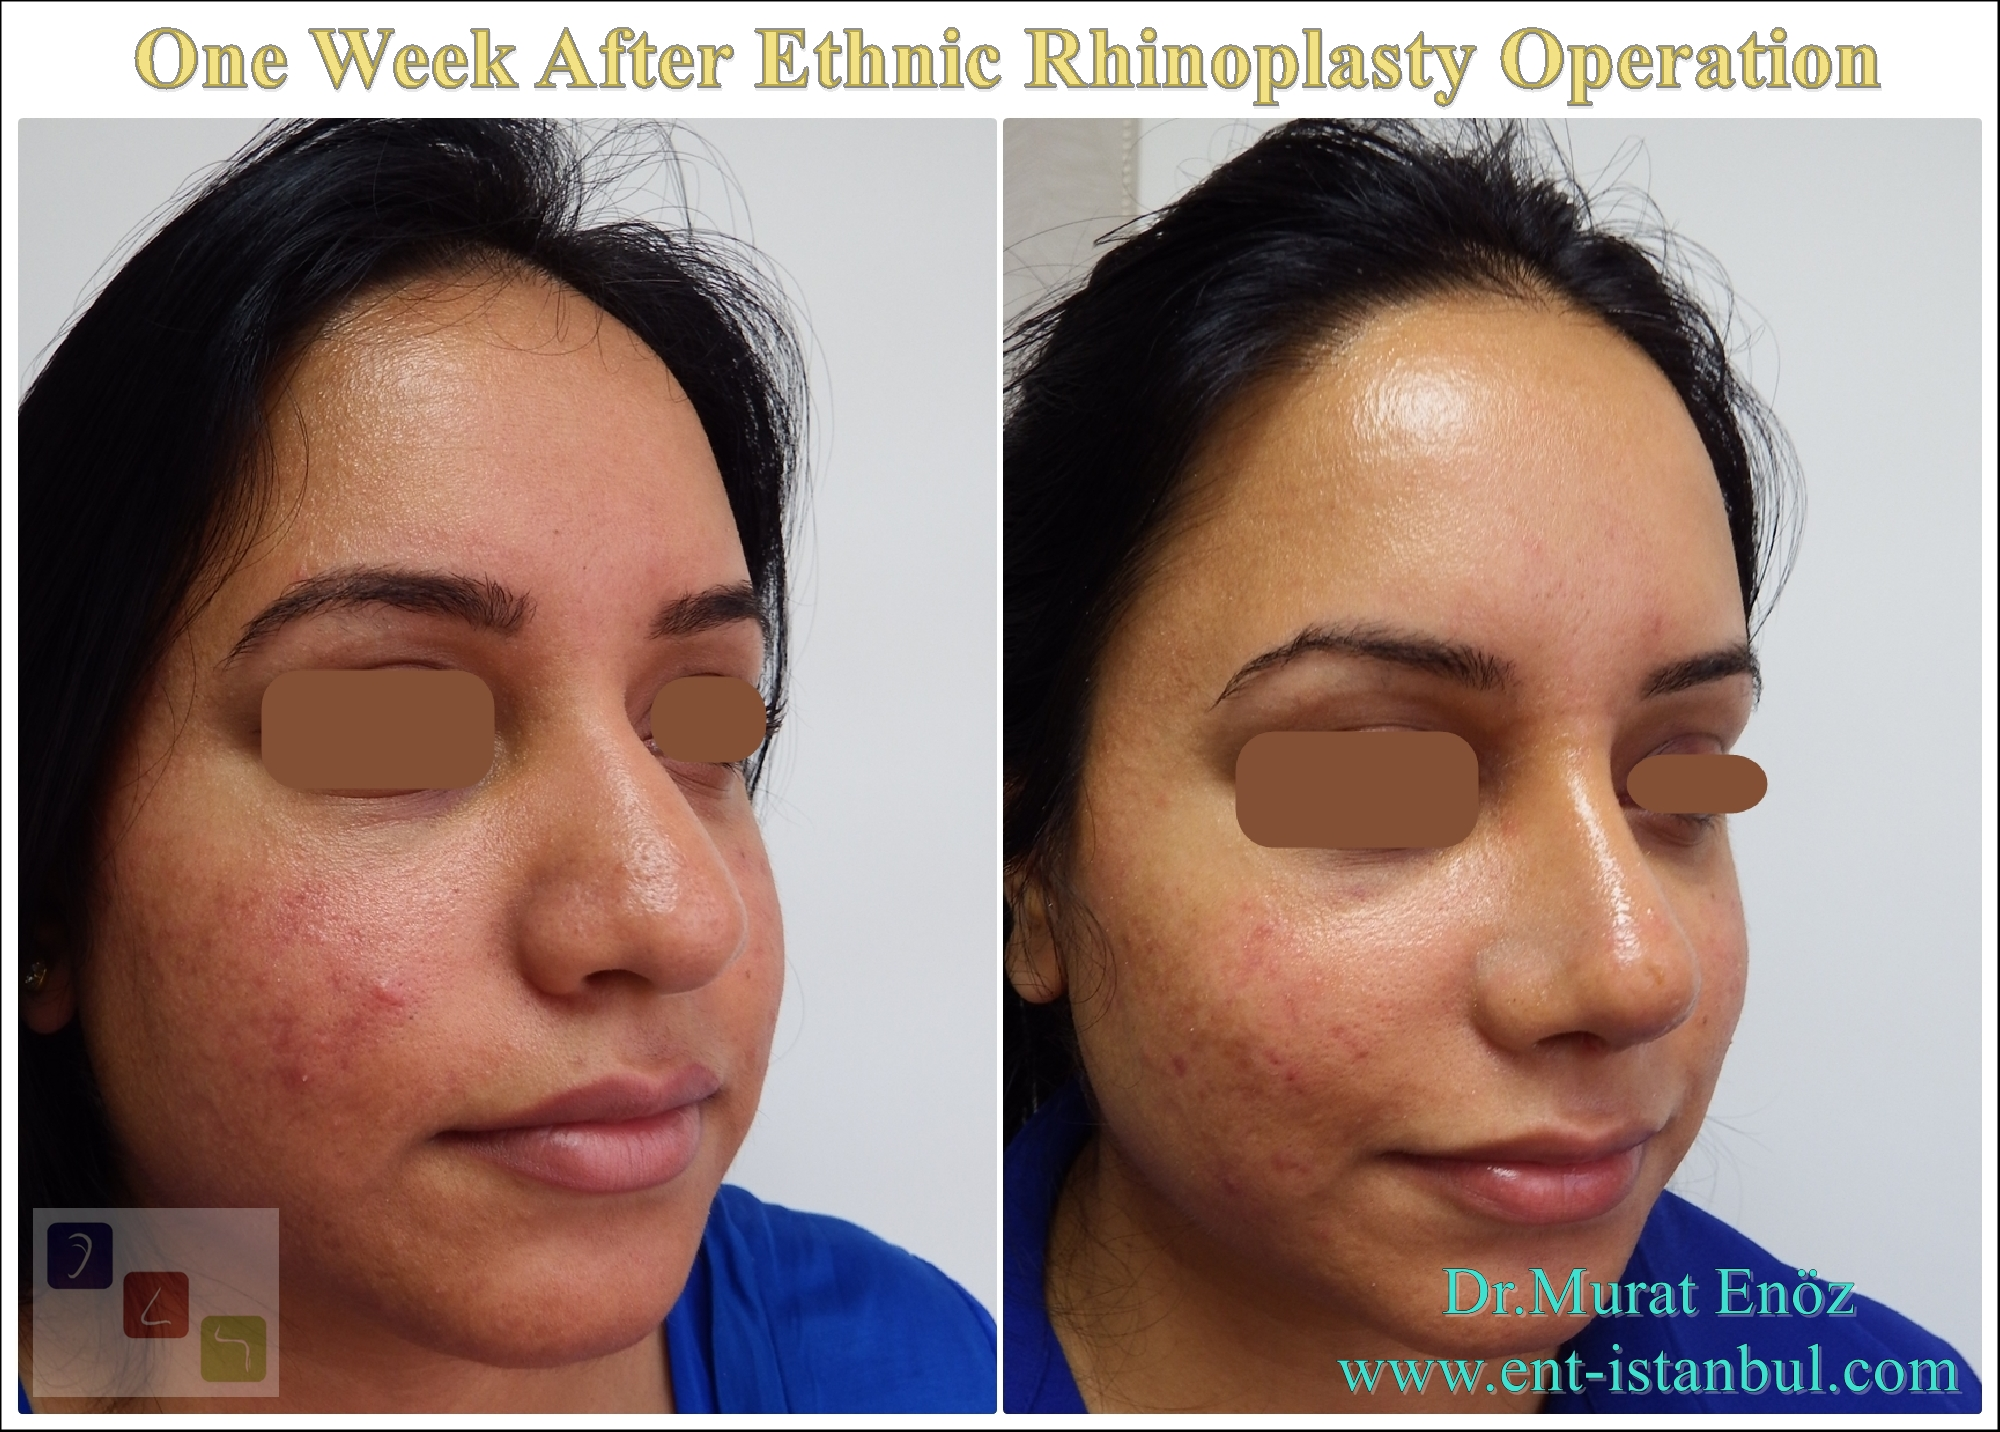 Rhinoplasty Healing Properties By Week And Month